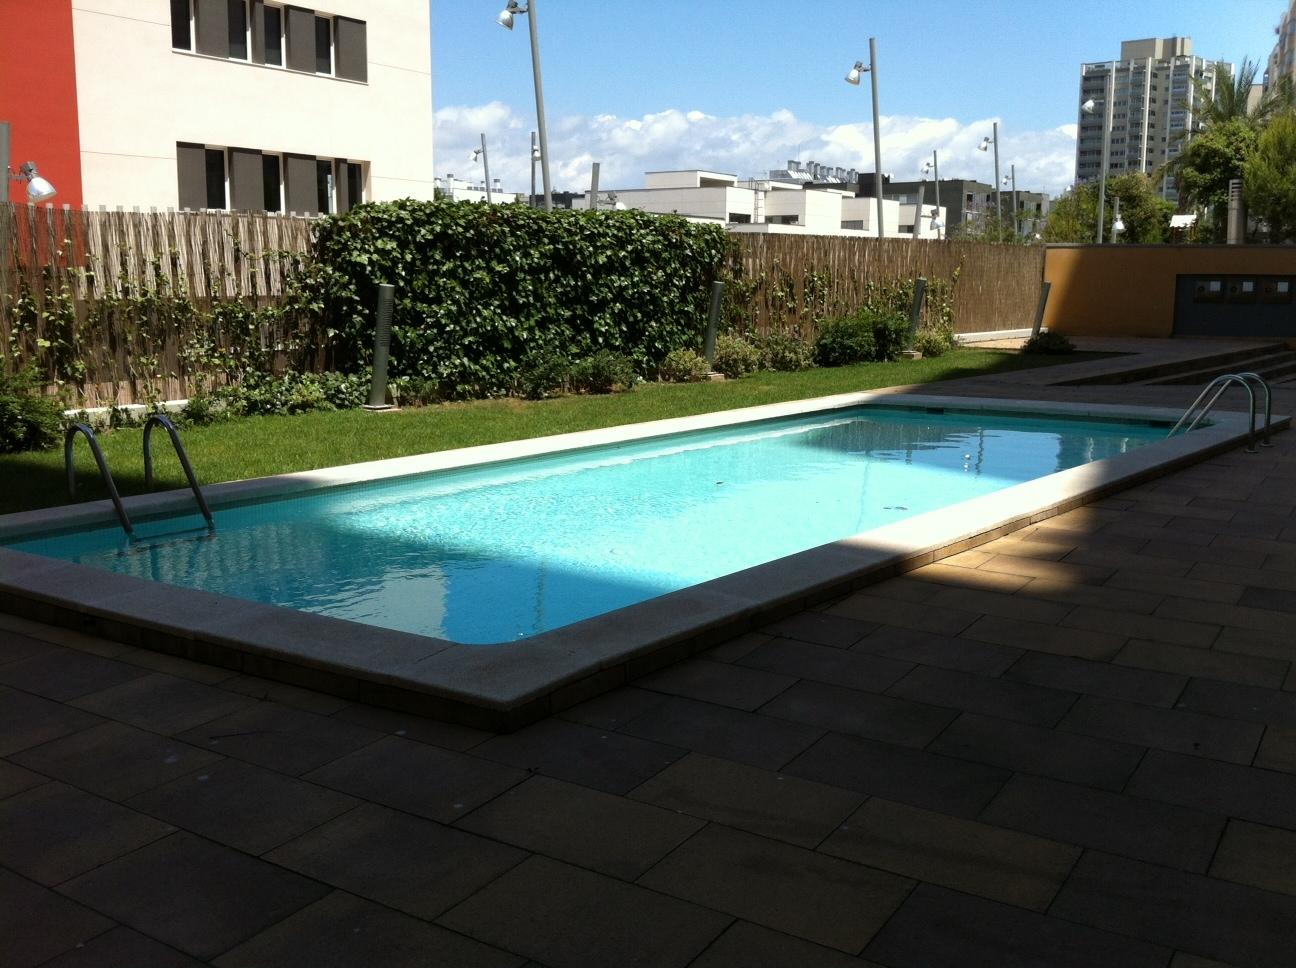 2 Bed Short Term Rental Apartment Barcelona